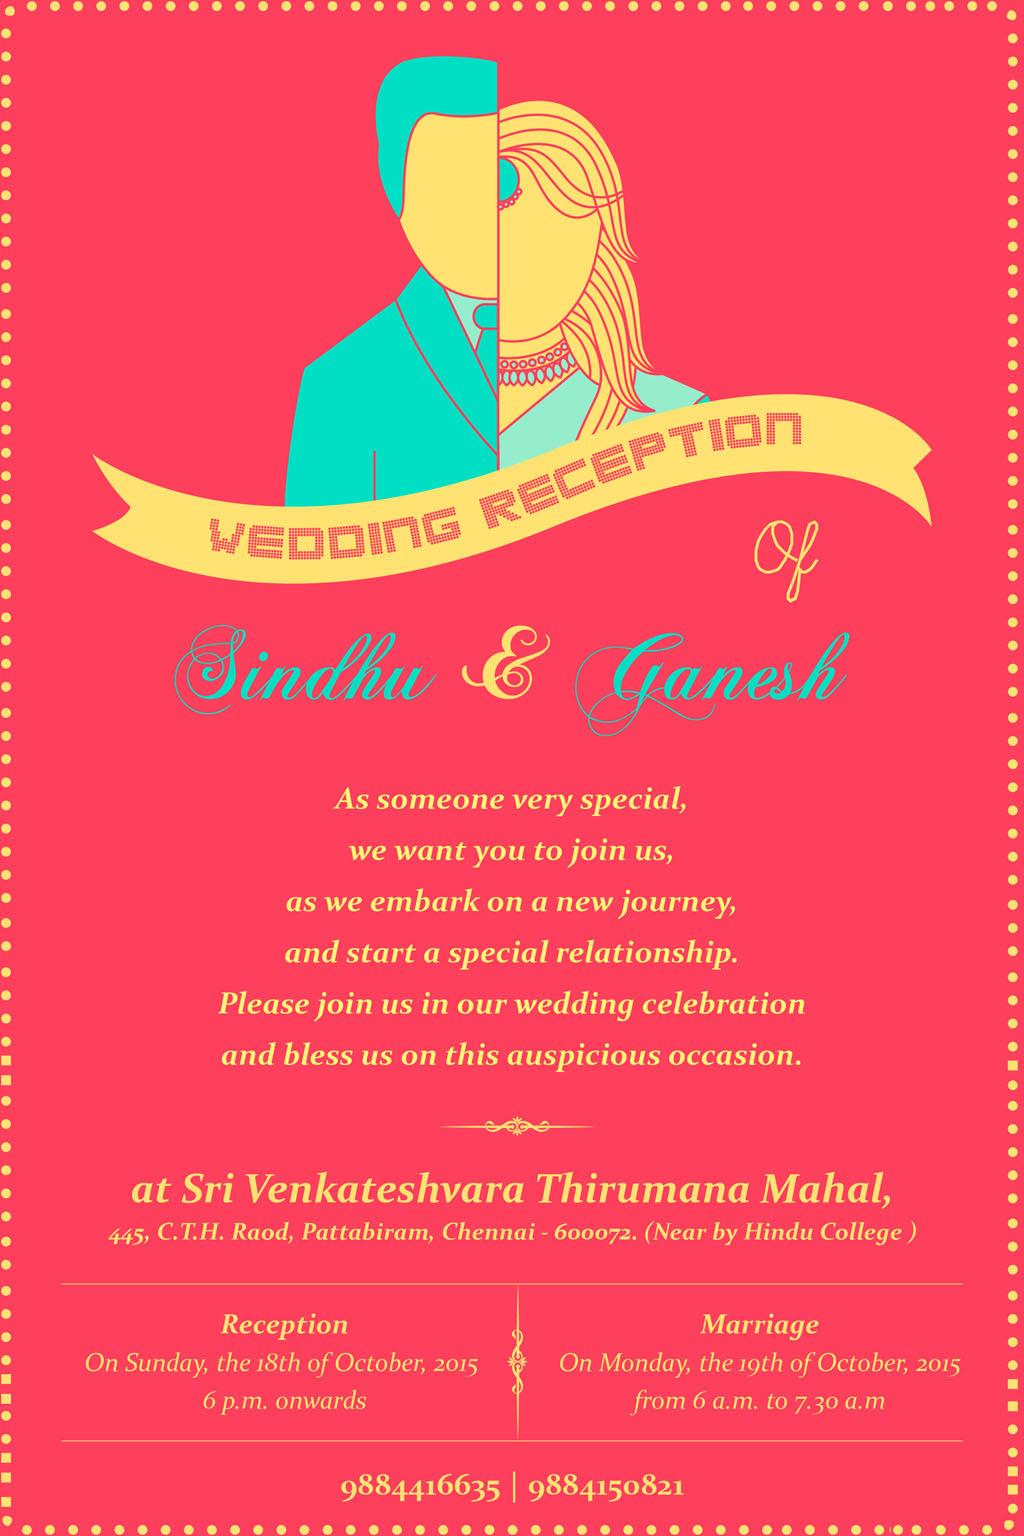 wedding reception invite on Behance